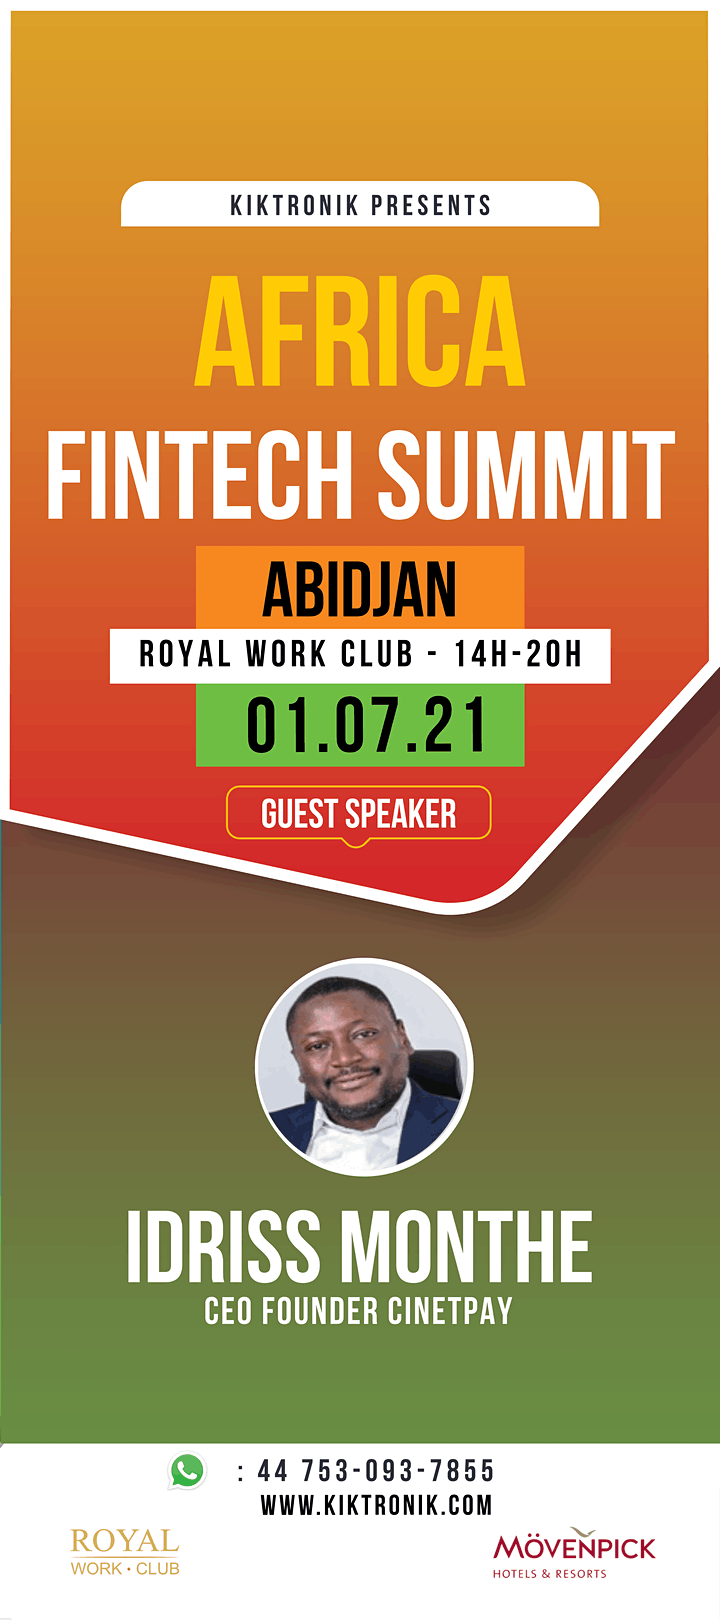 Africa Fintech Summit in Abidjan image